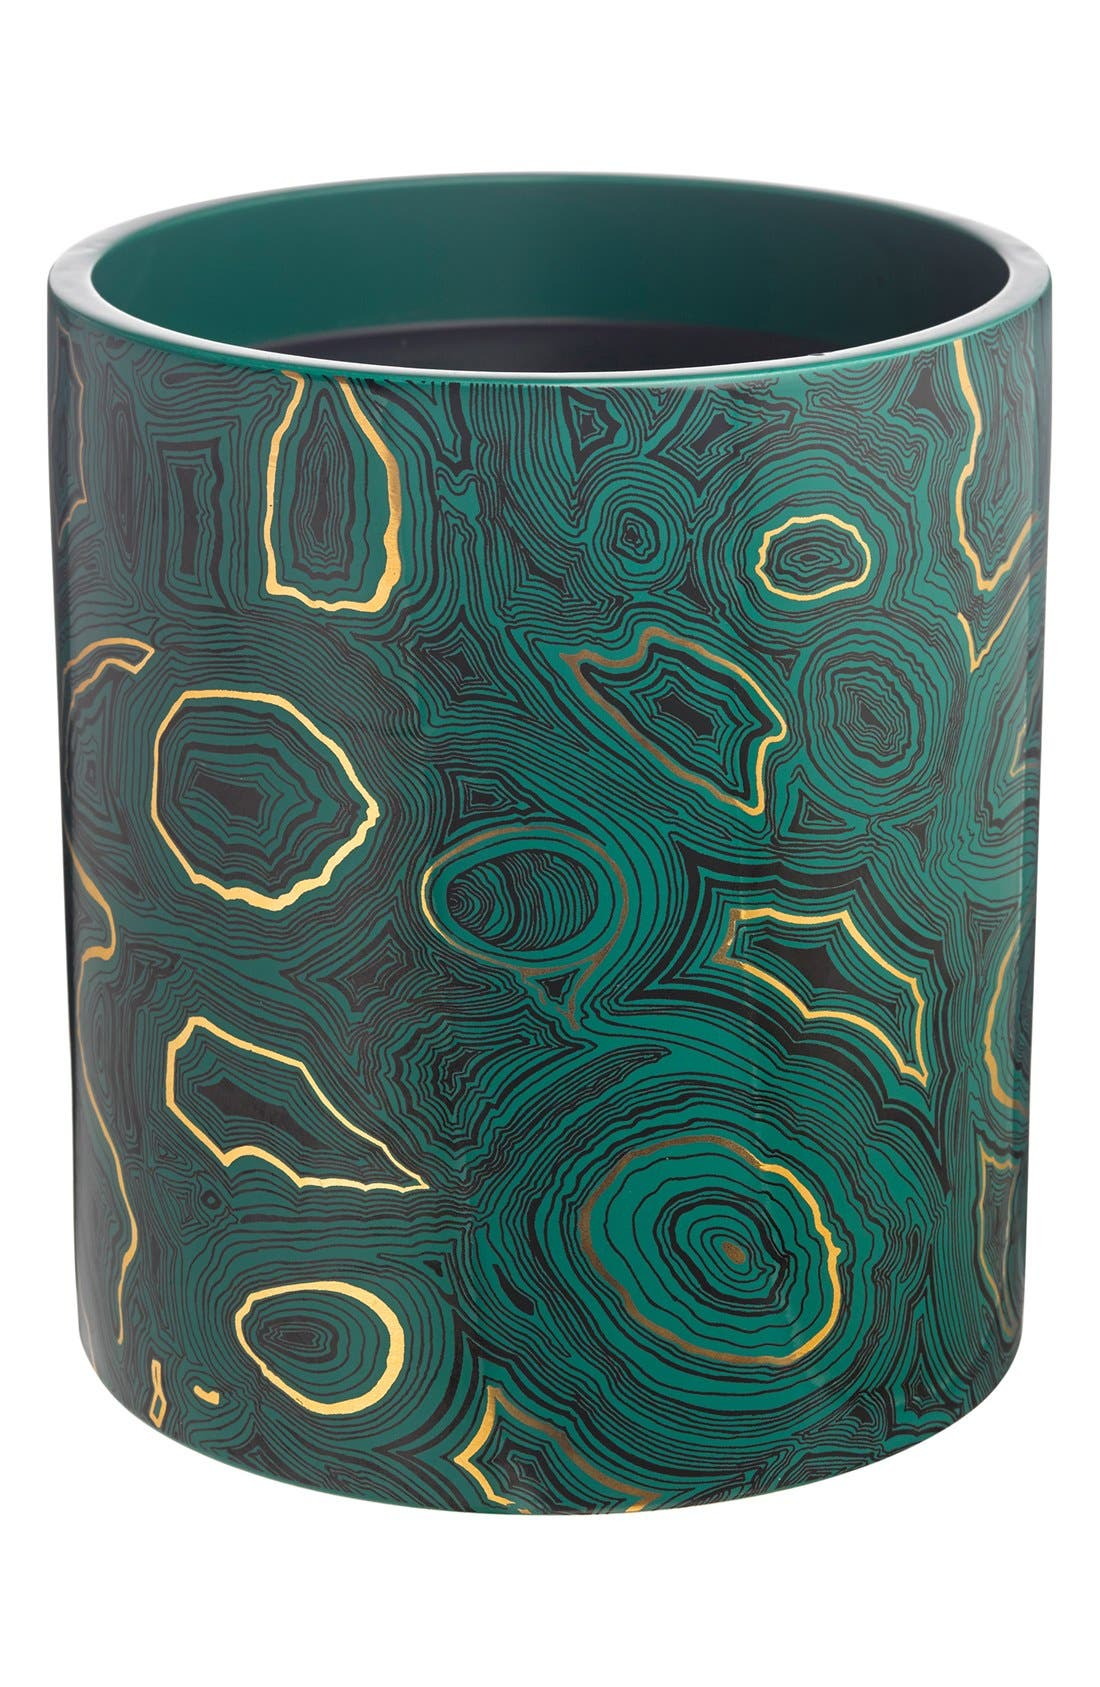 Fornasetti 'Malachite' Large Candle